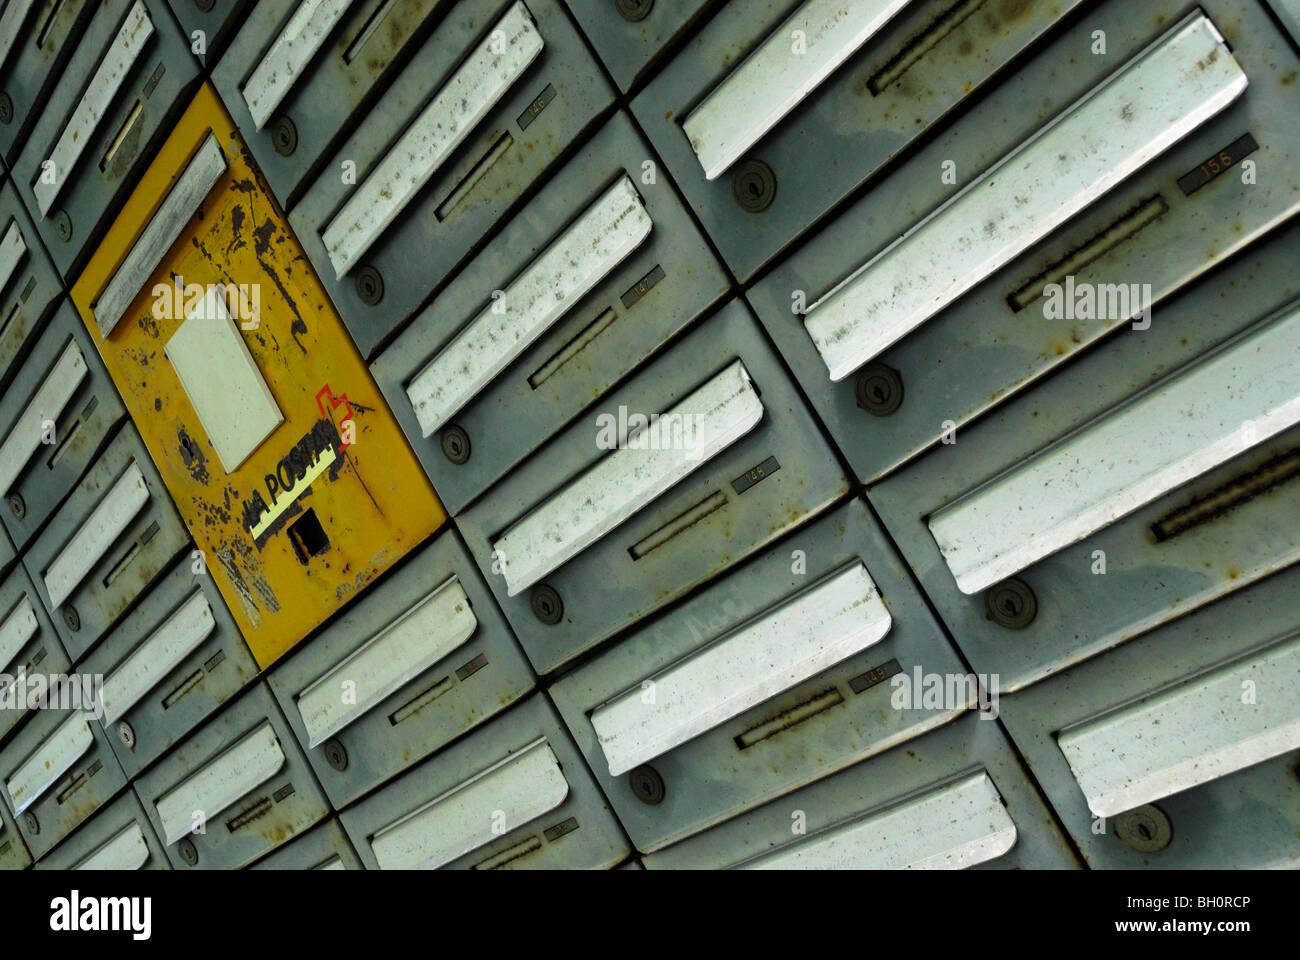 Rows of letter boxes, Orselina, Locarno, Ticino, Switzerland - Stock Image